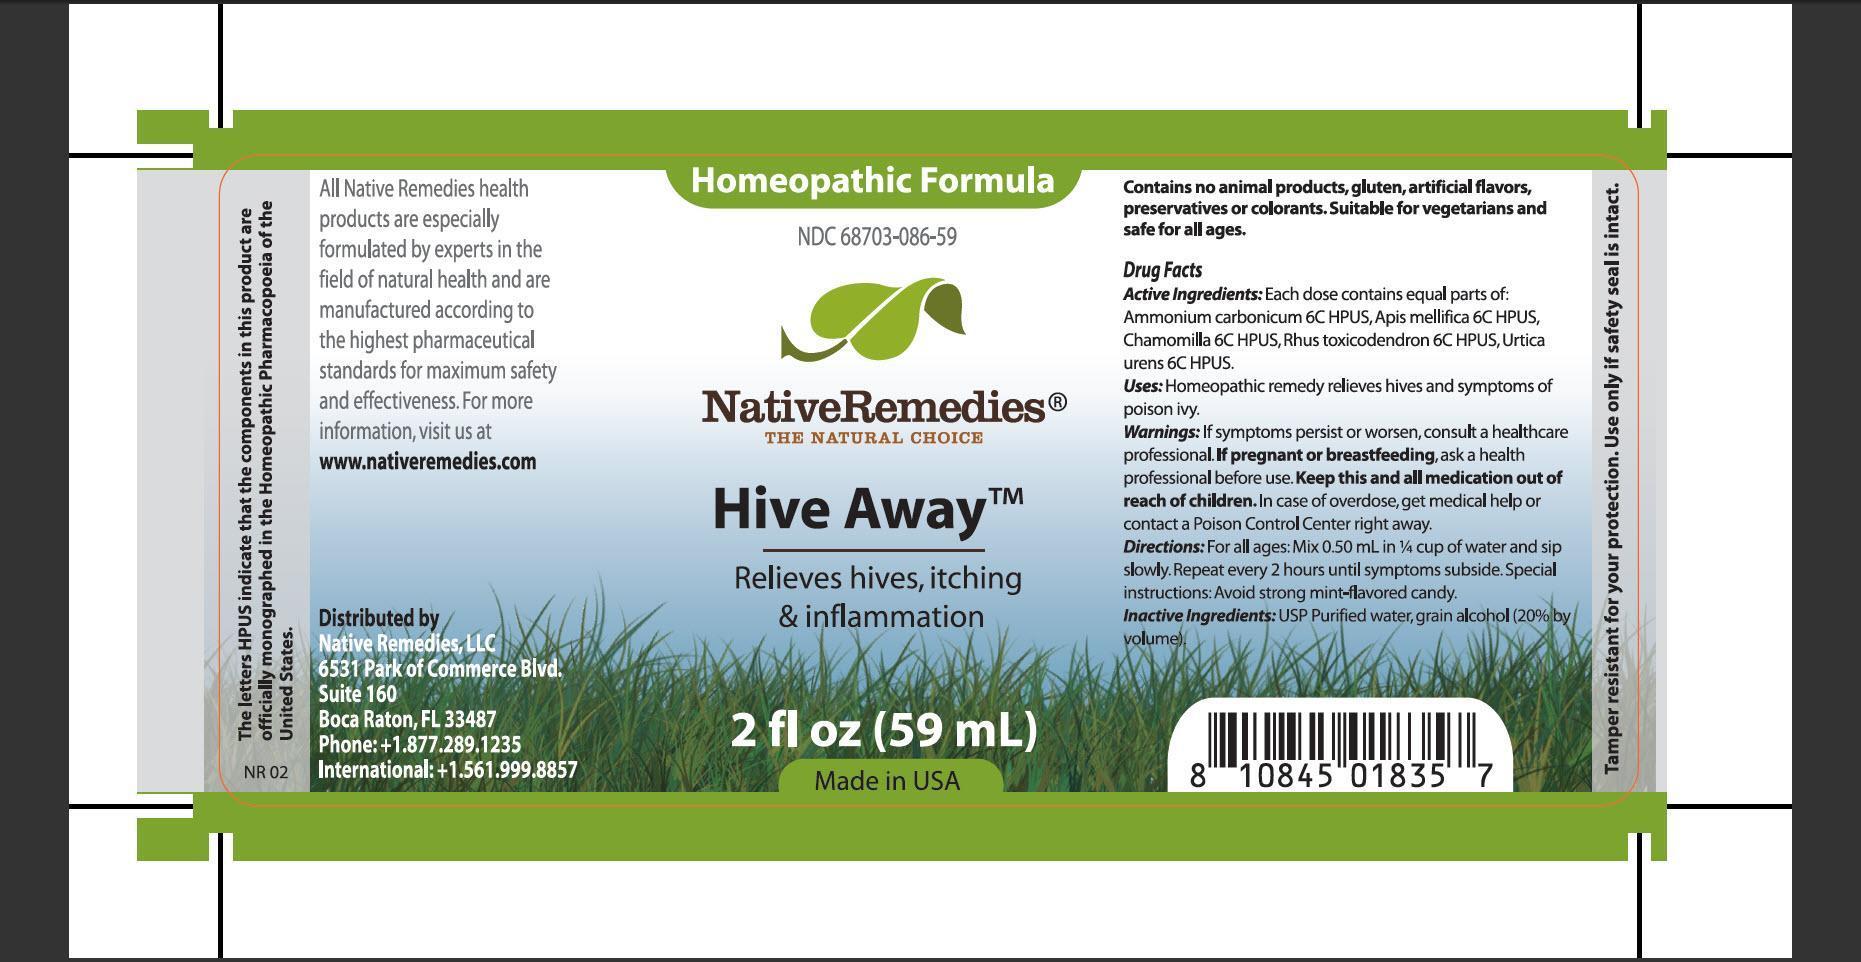 Hive Away (Ammonium Carbonicum, Apis Mellifica, Chamomilla, Rhus Toxicodendron, Urtica Urens) Tincture [Native Remedies, Llc]